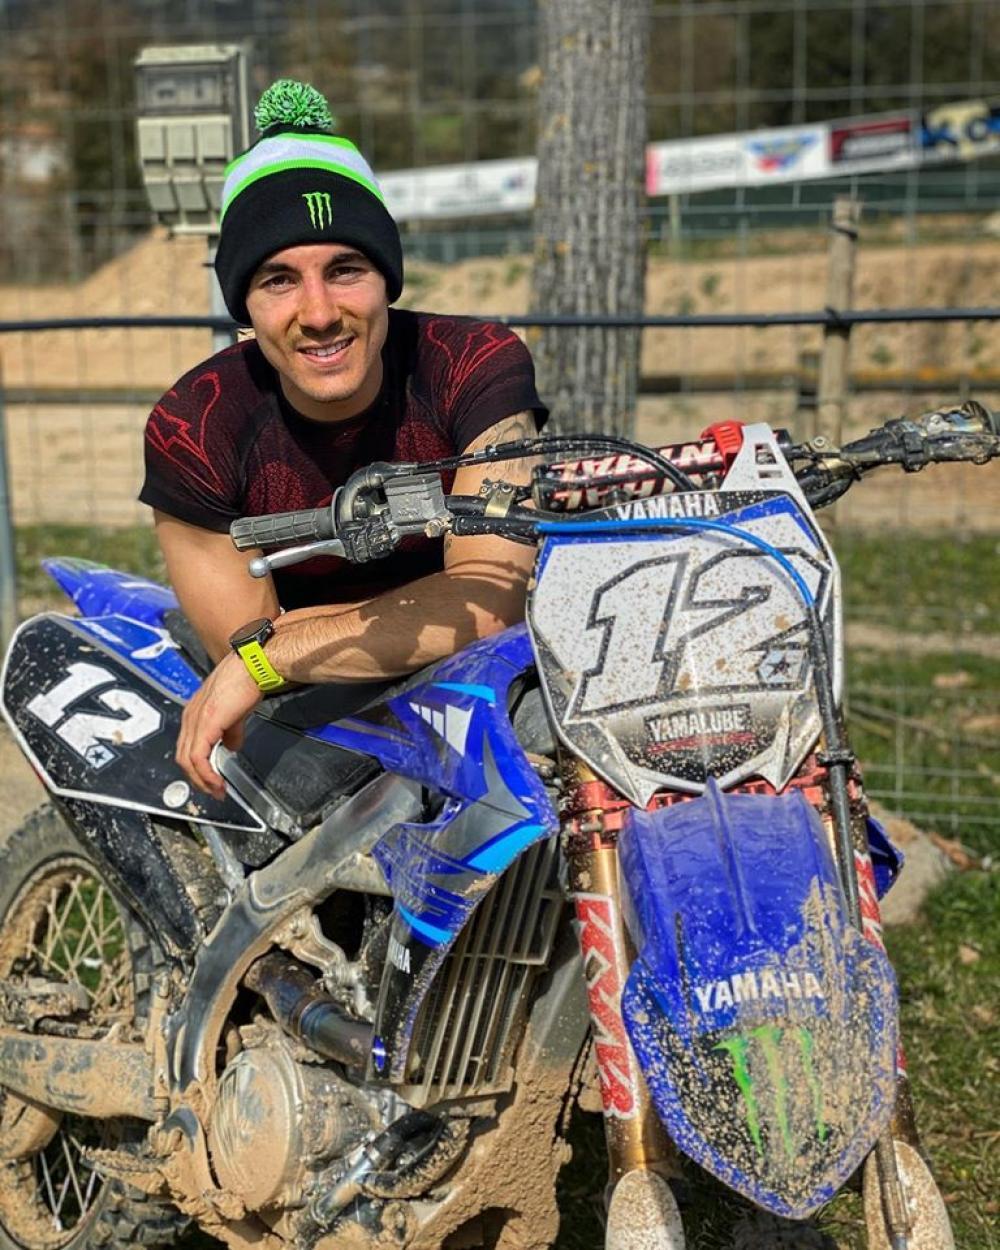 MotoGP | Spavento Viñales: incidente in MX, passa la notte in ospedale